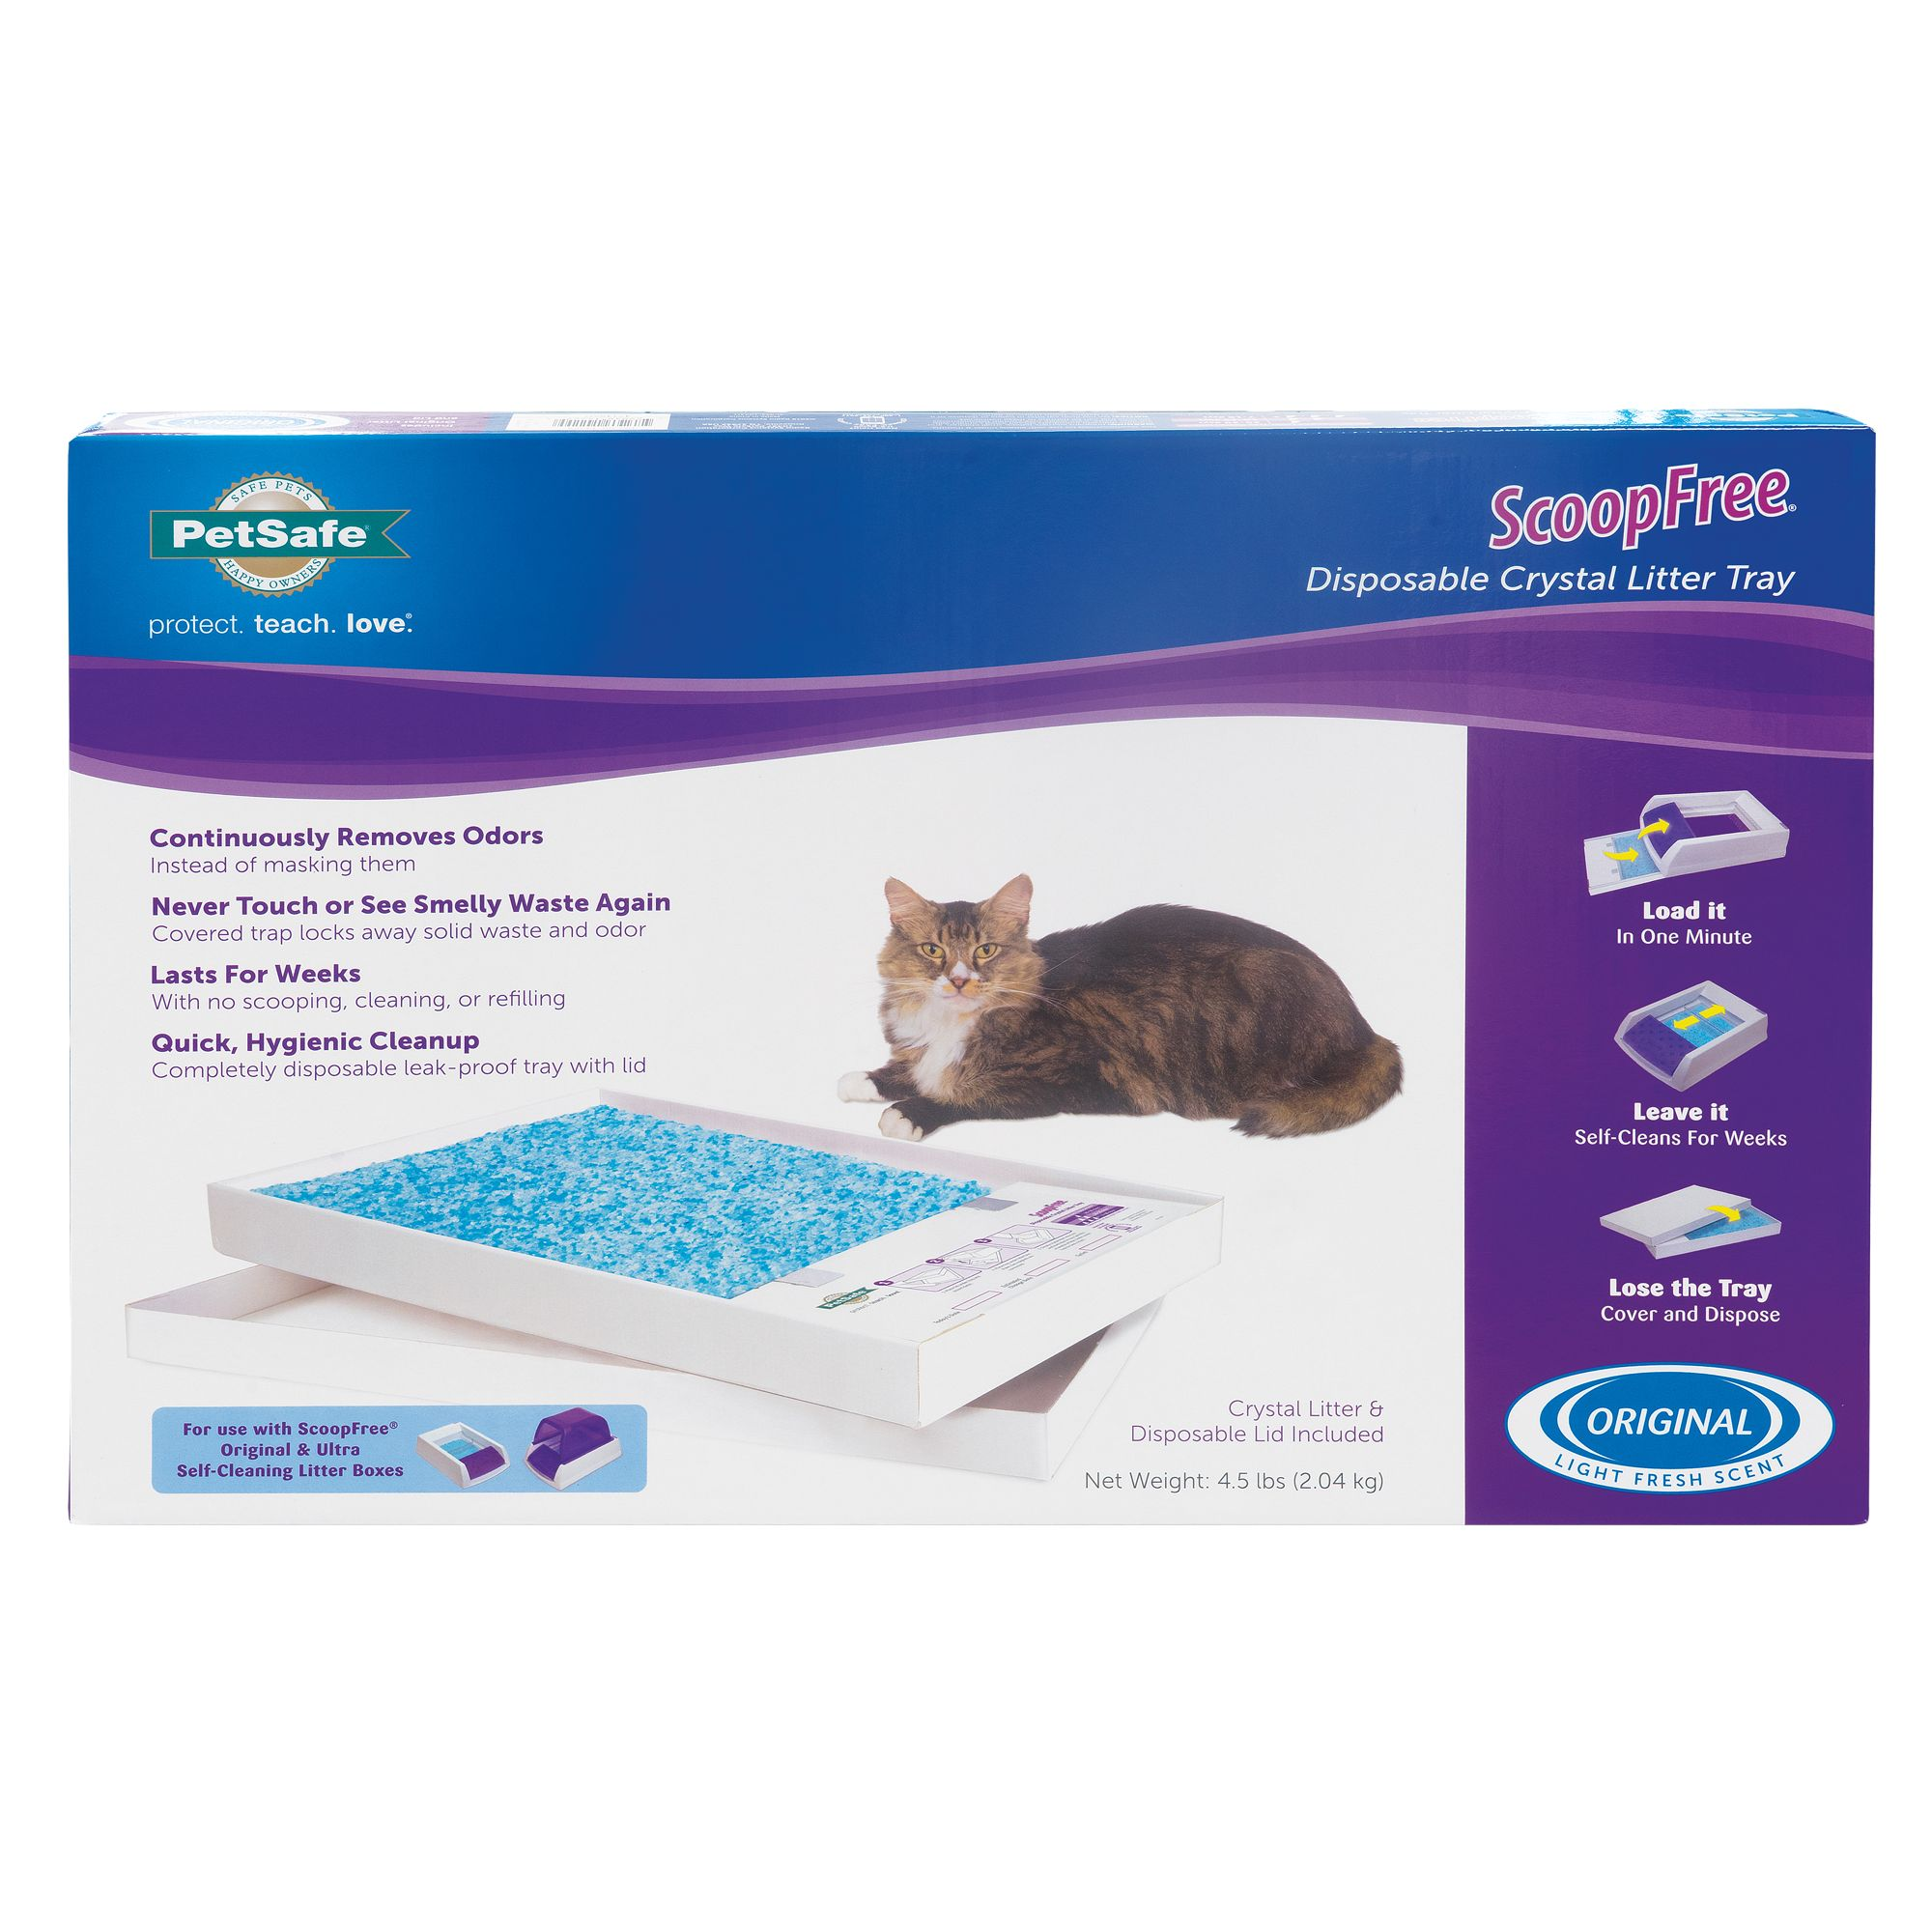 Petsafe Scoopfree Cat Litter Box Refill Cartridge Size 1 Count